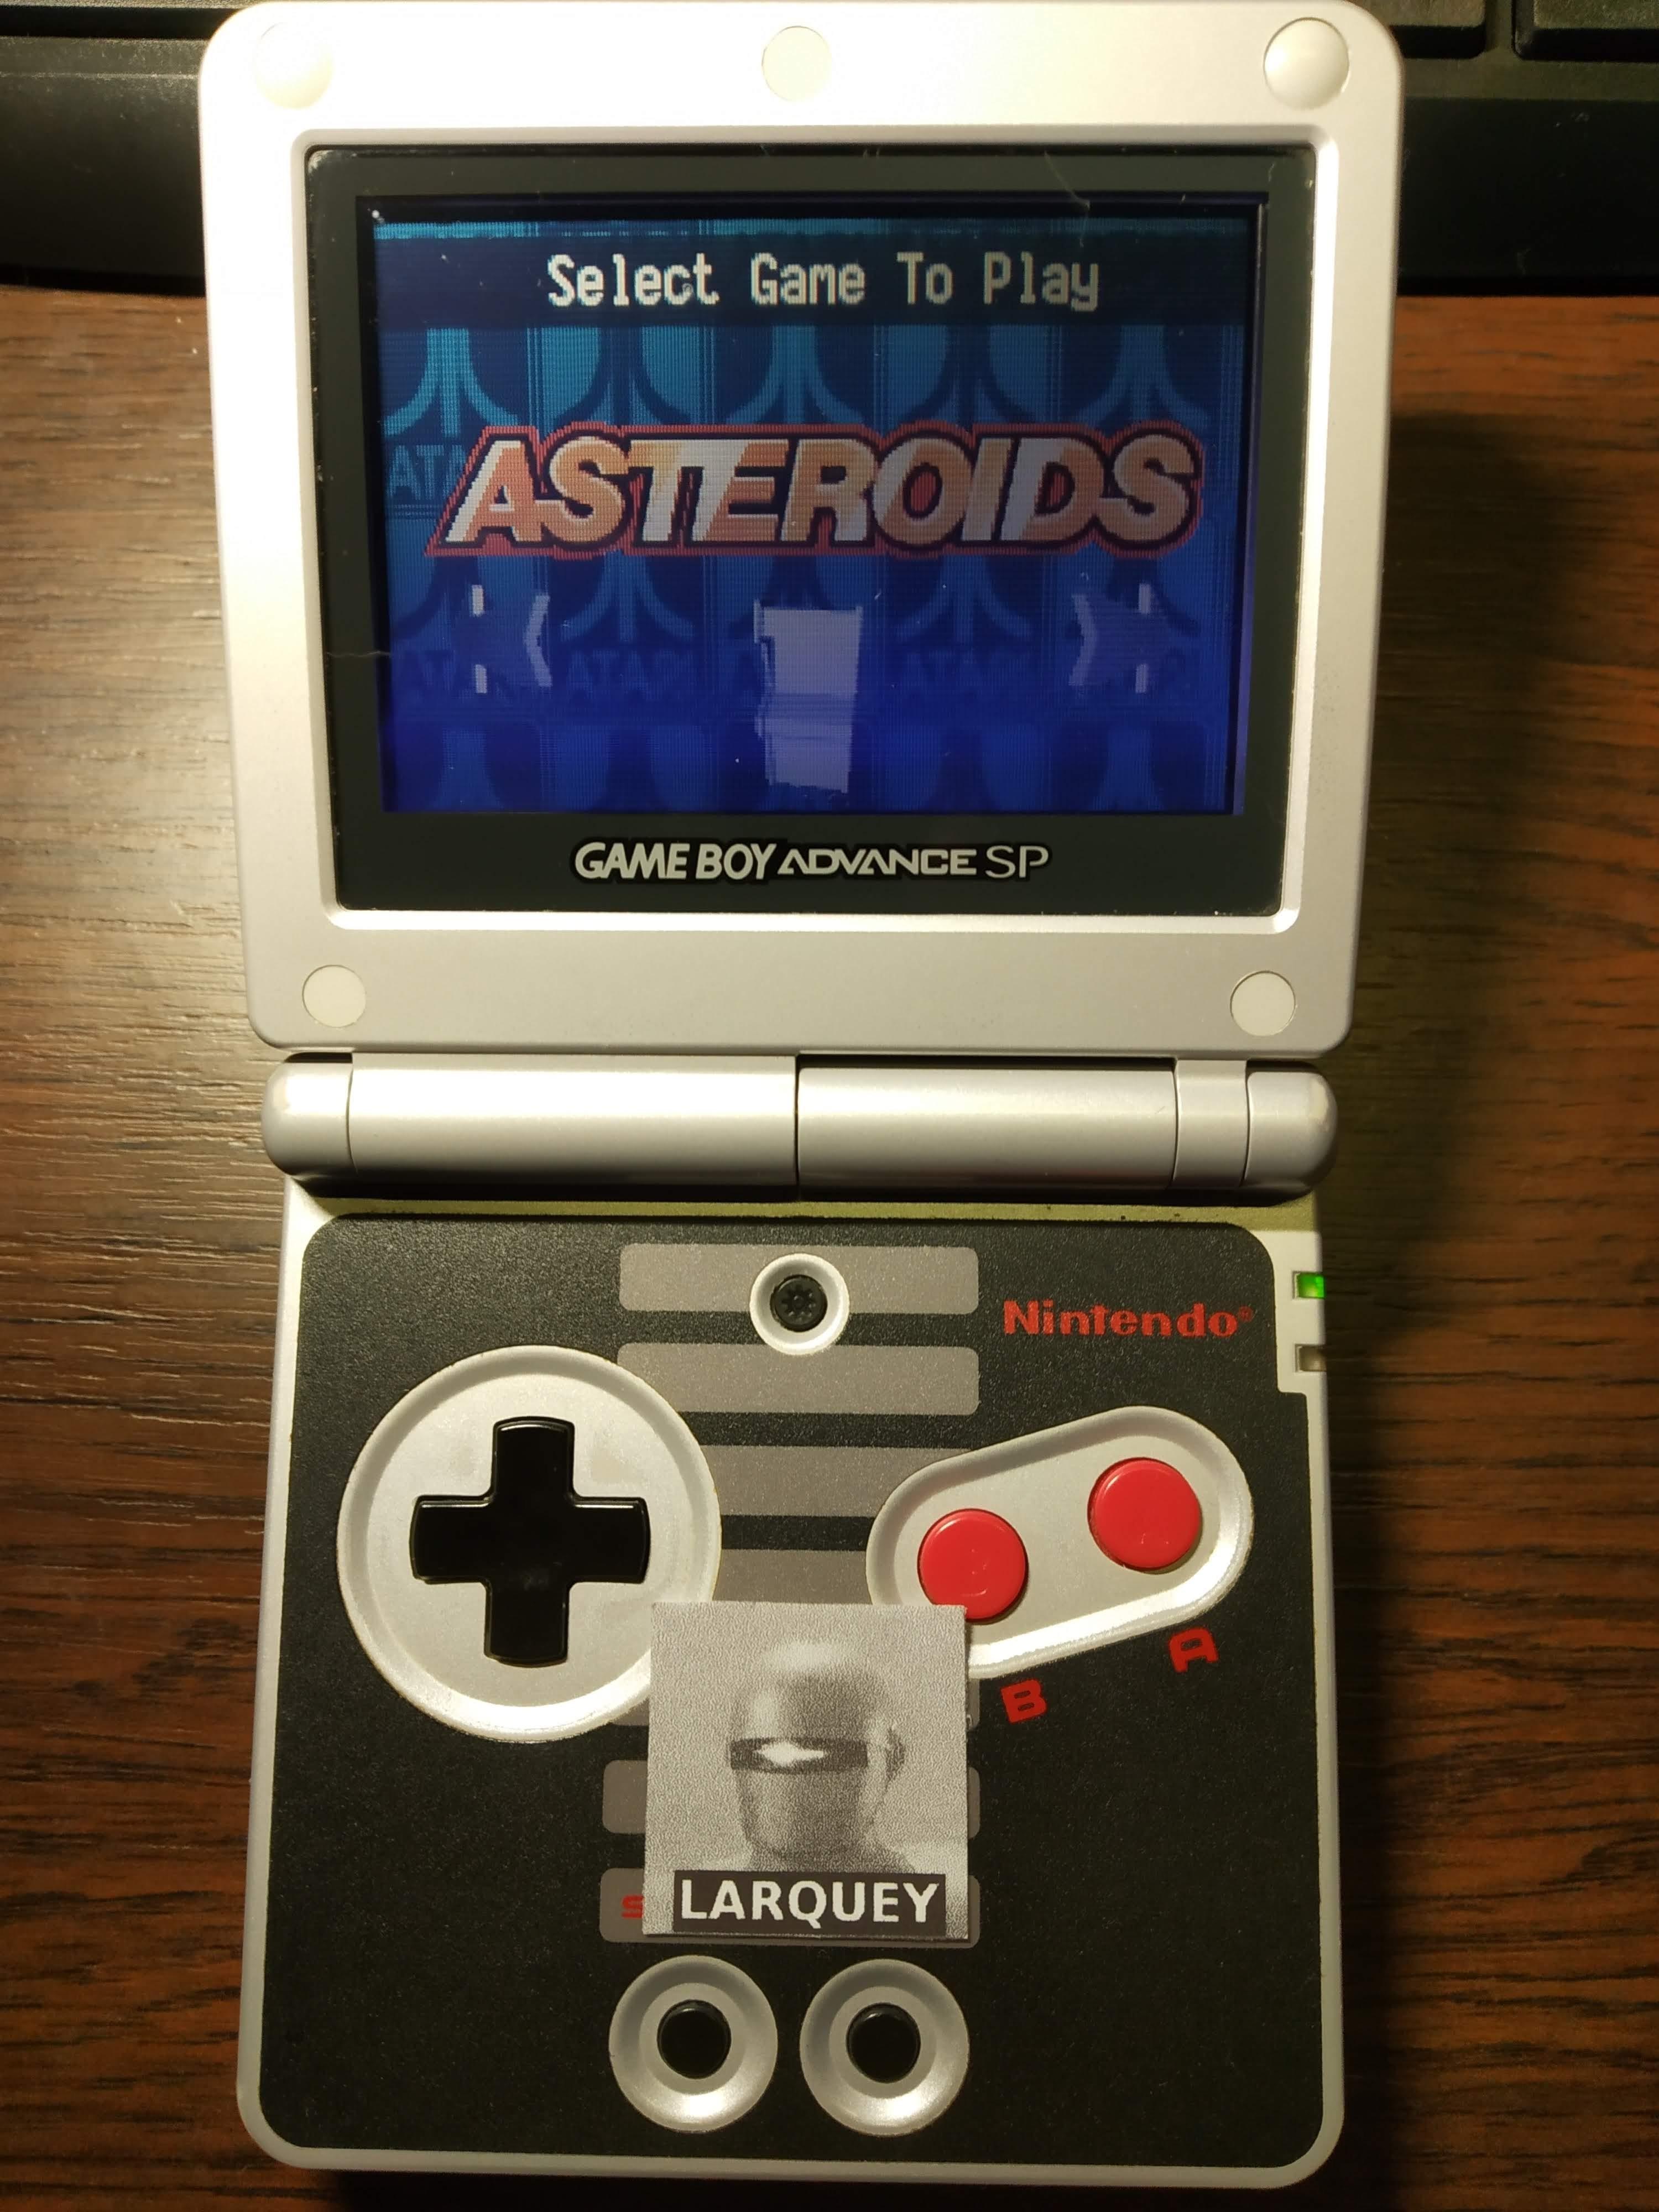 Larquey: Atari Anniversary Advance: Asteroids (GBA) 19,960 points on 2020-01-06 12:08:06